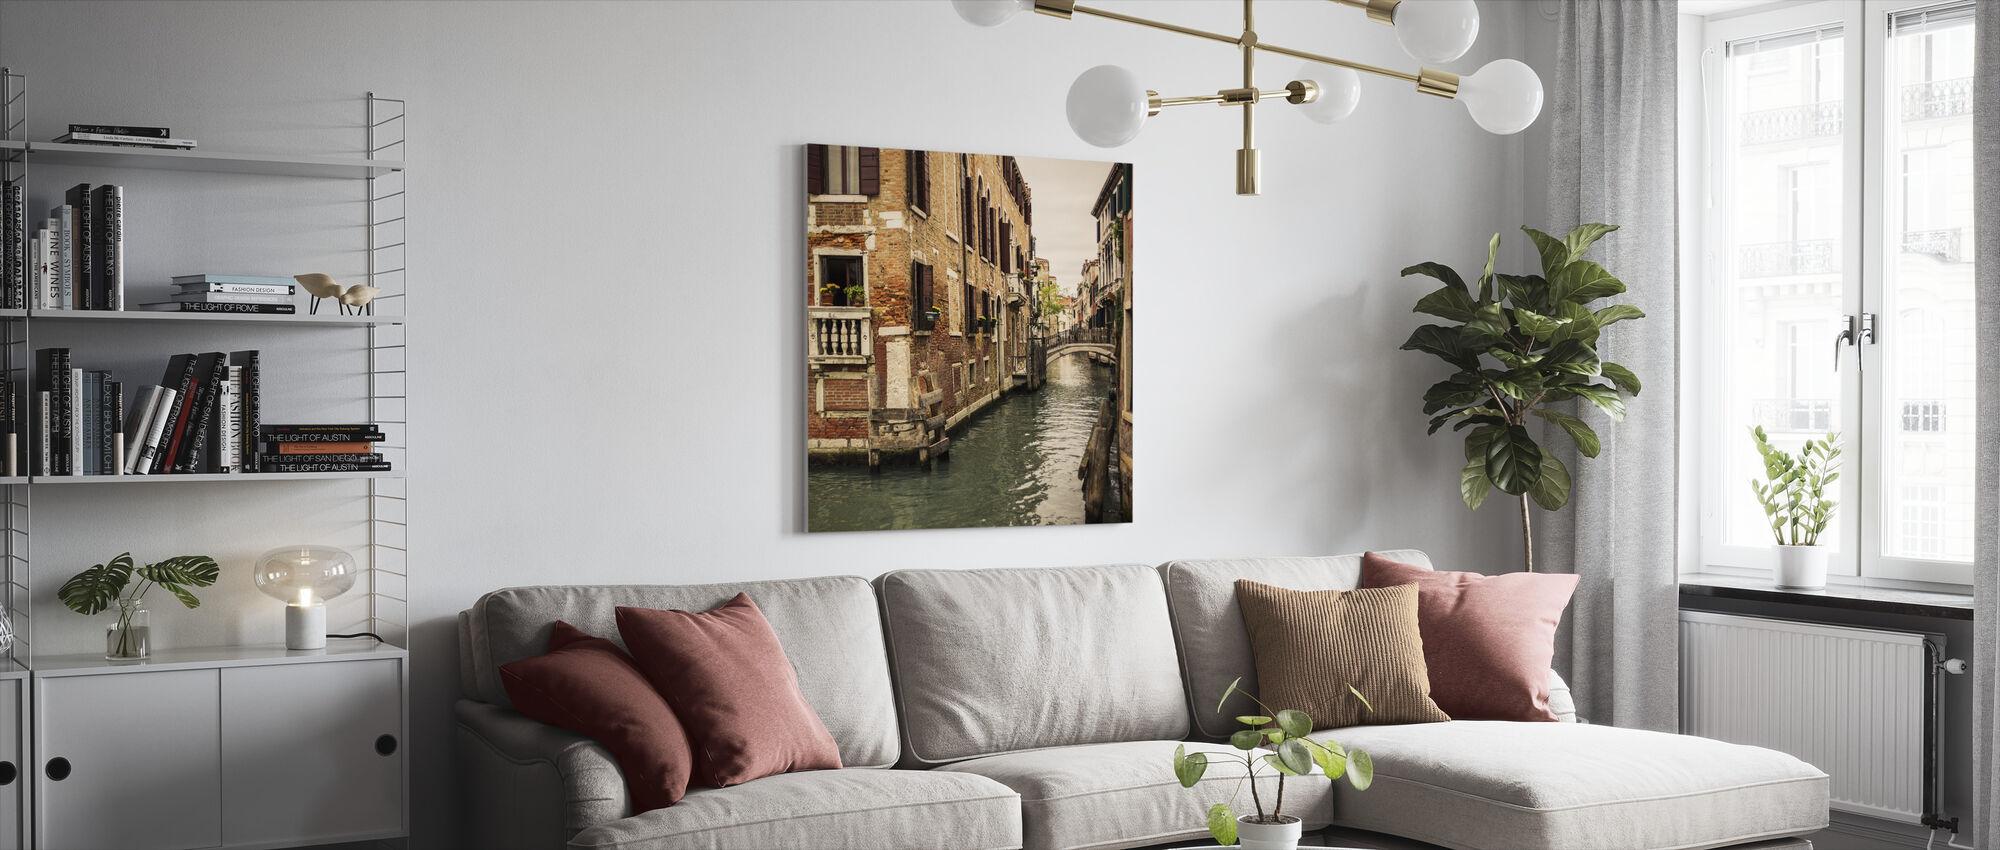 Mursten og broer i Venedig - Lerretsbilde - Stue